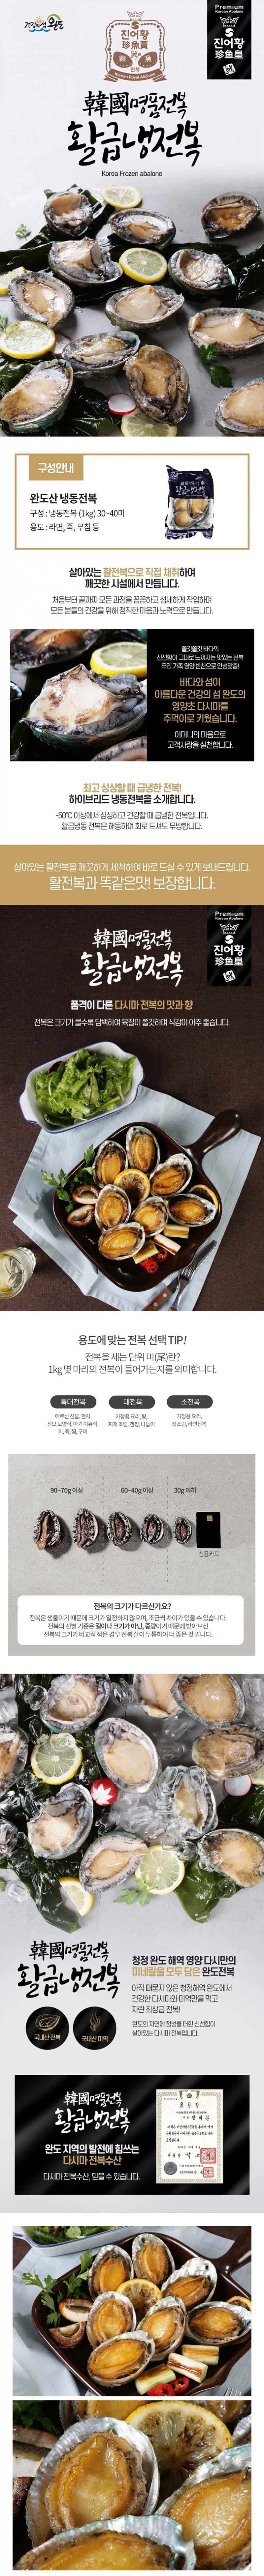 [overnight배송] 다시마전복수산 전복 1kg 1팩 (30미~40미)